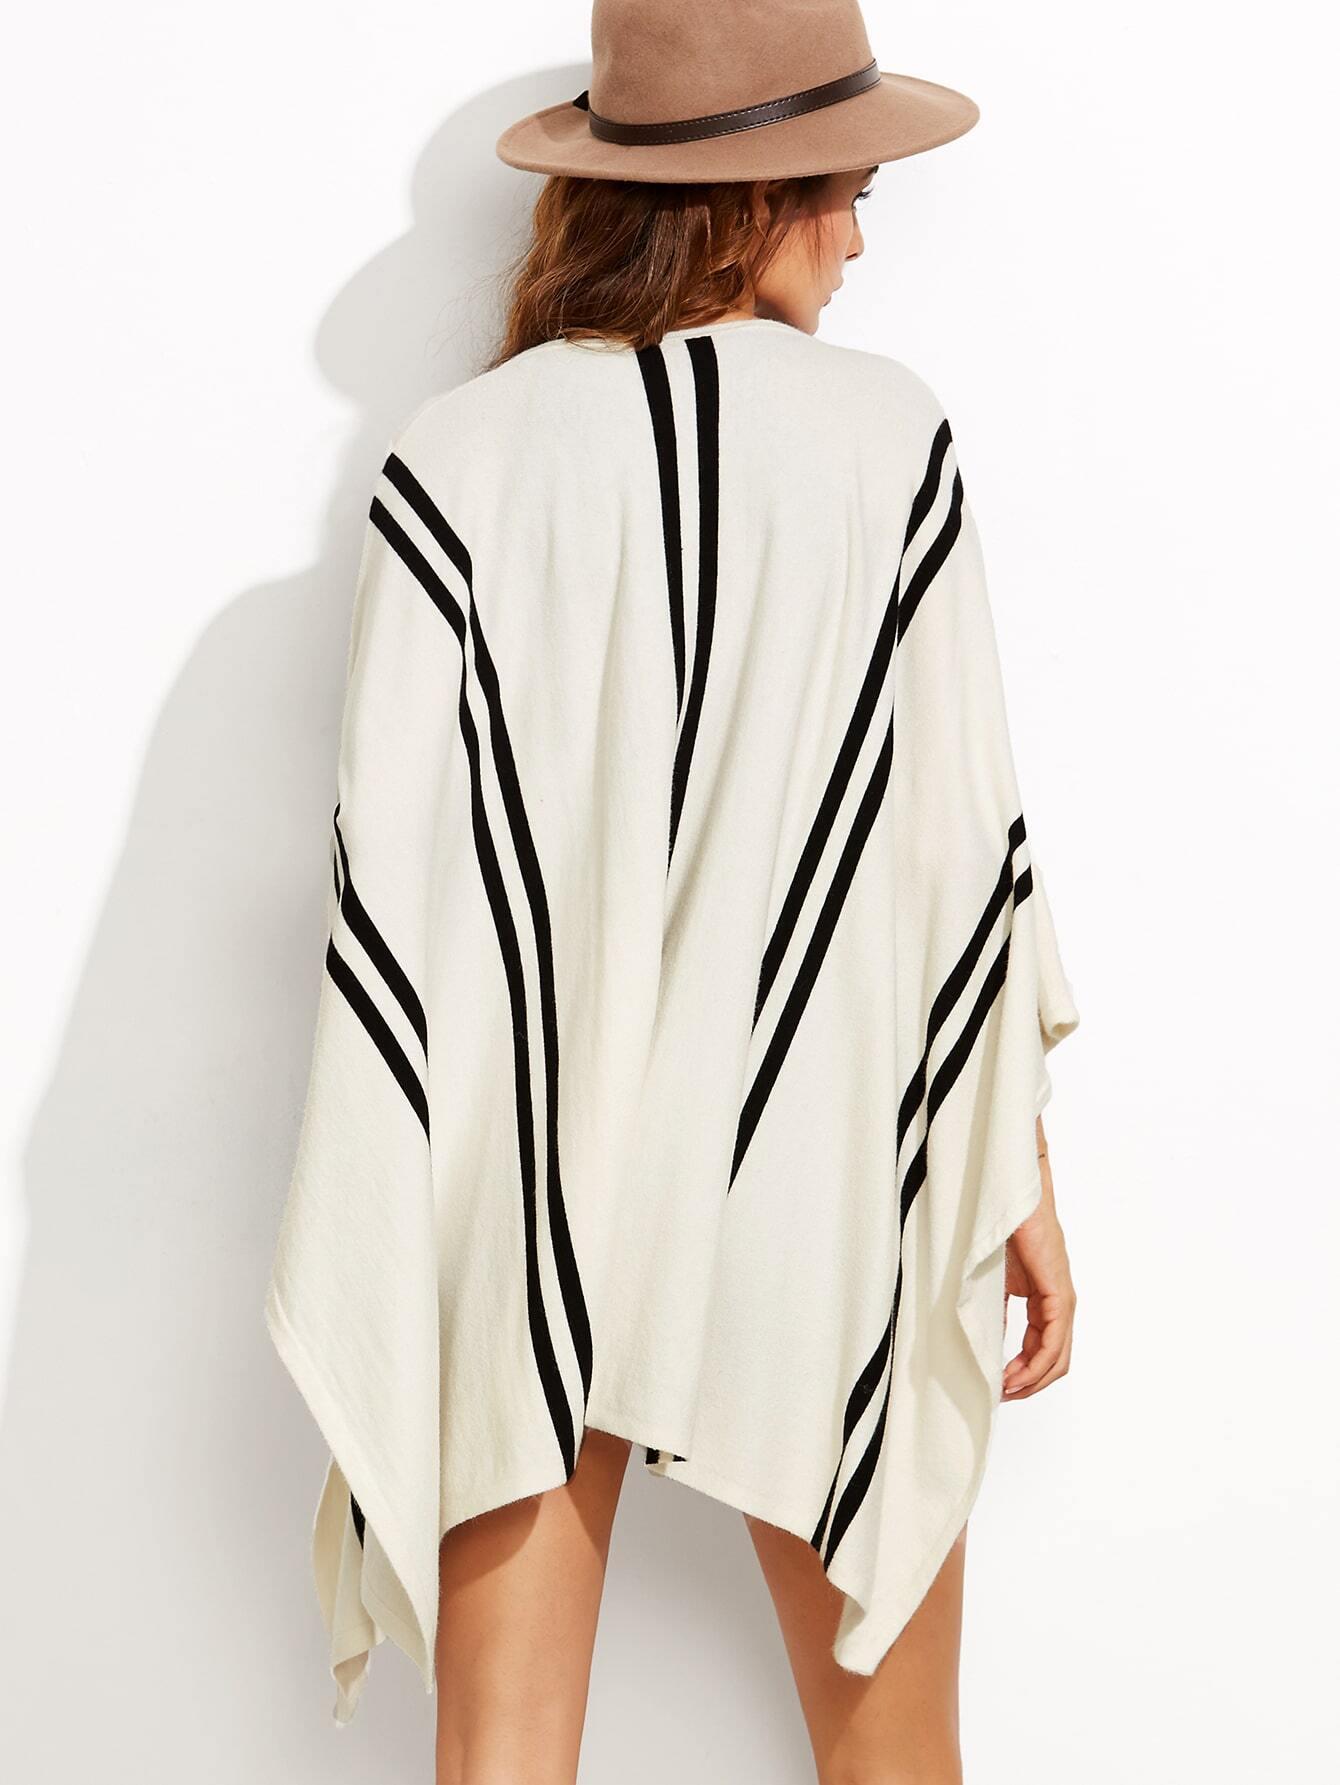 sweater160810709_2